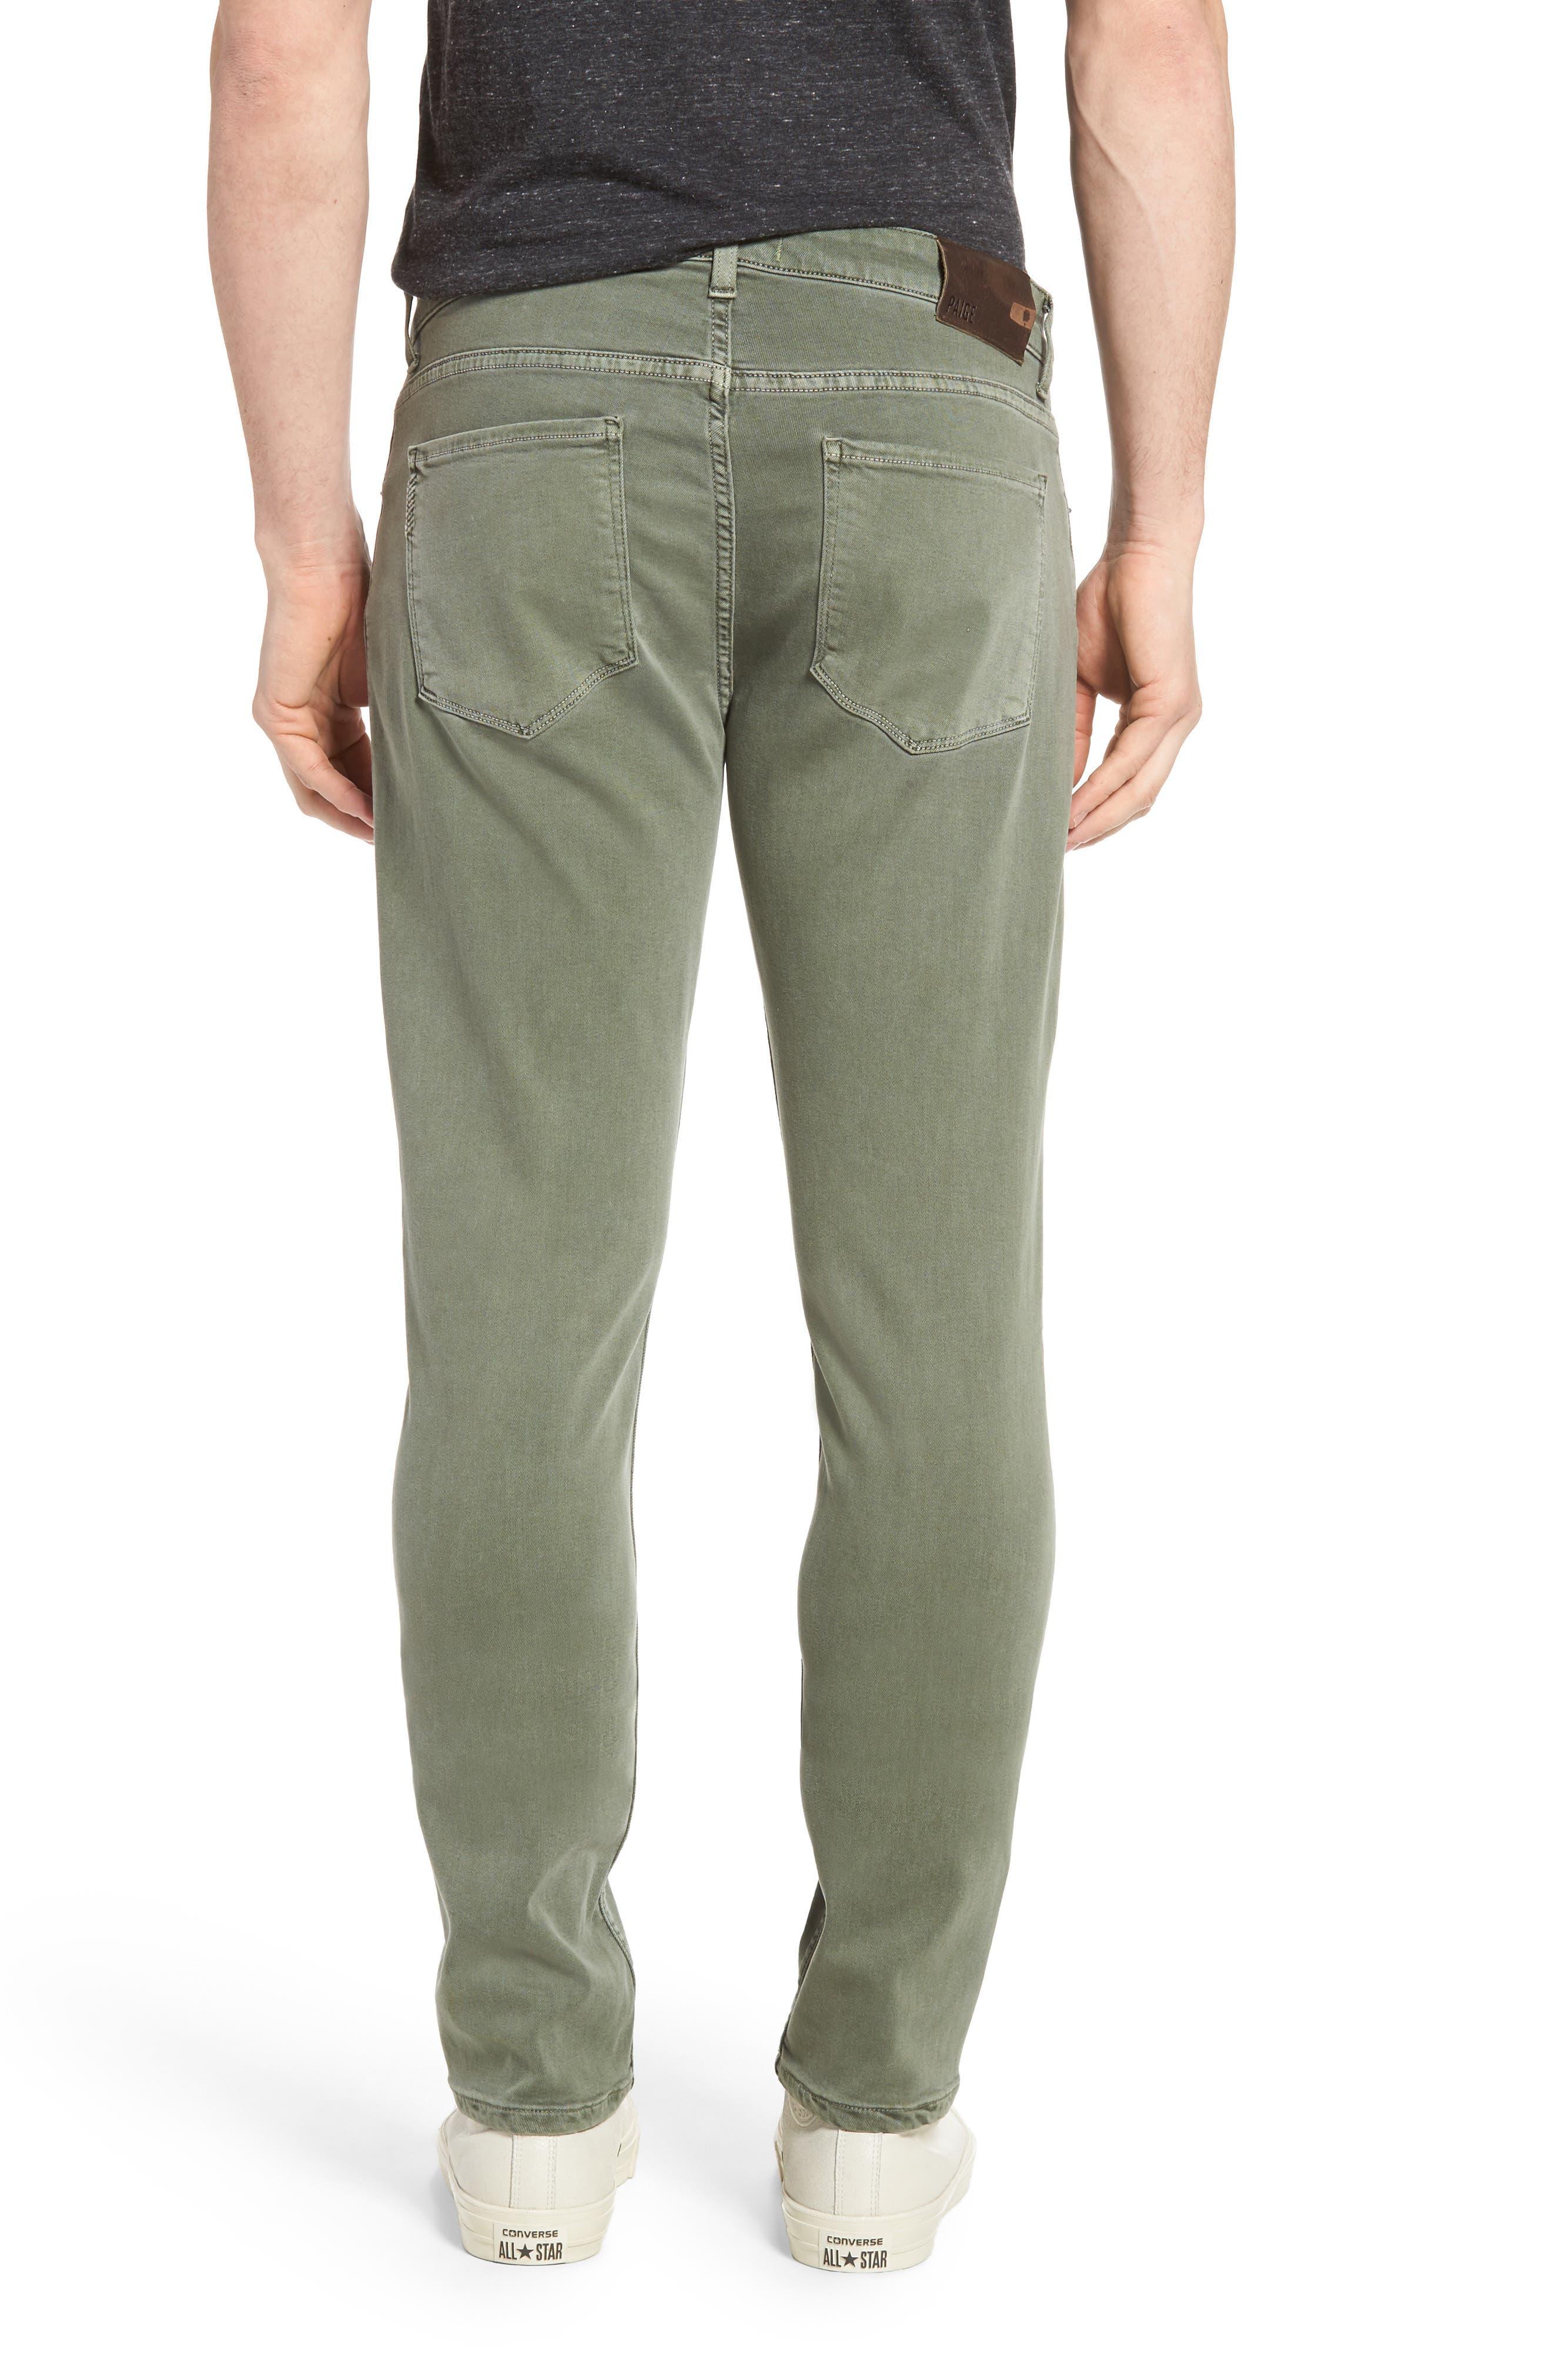 Transcend - Lennox Slim Fit Jeans,                             Alternate thumbnail 2, color,                             300